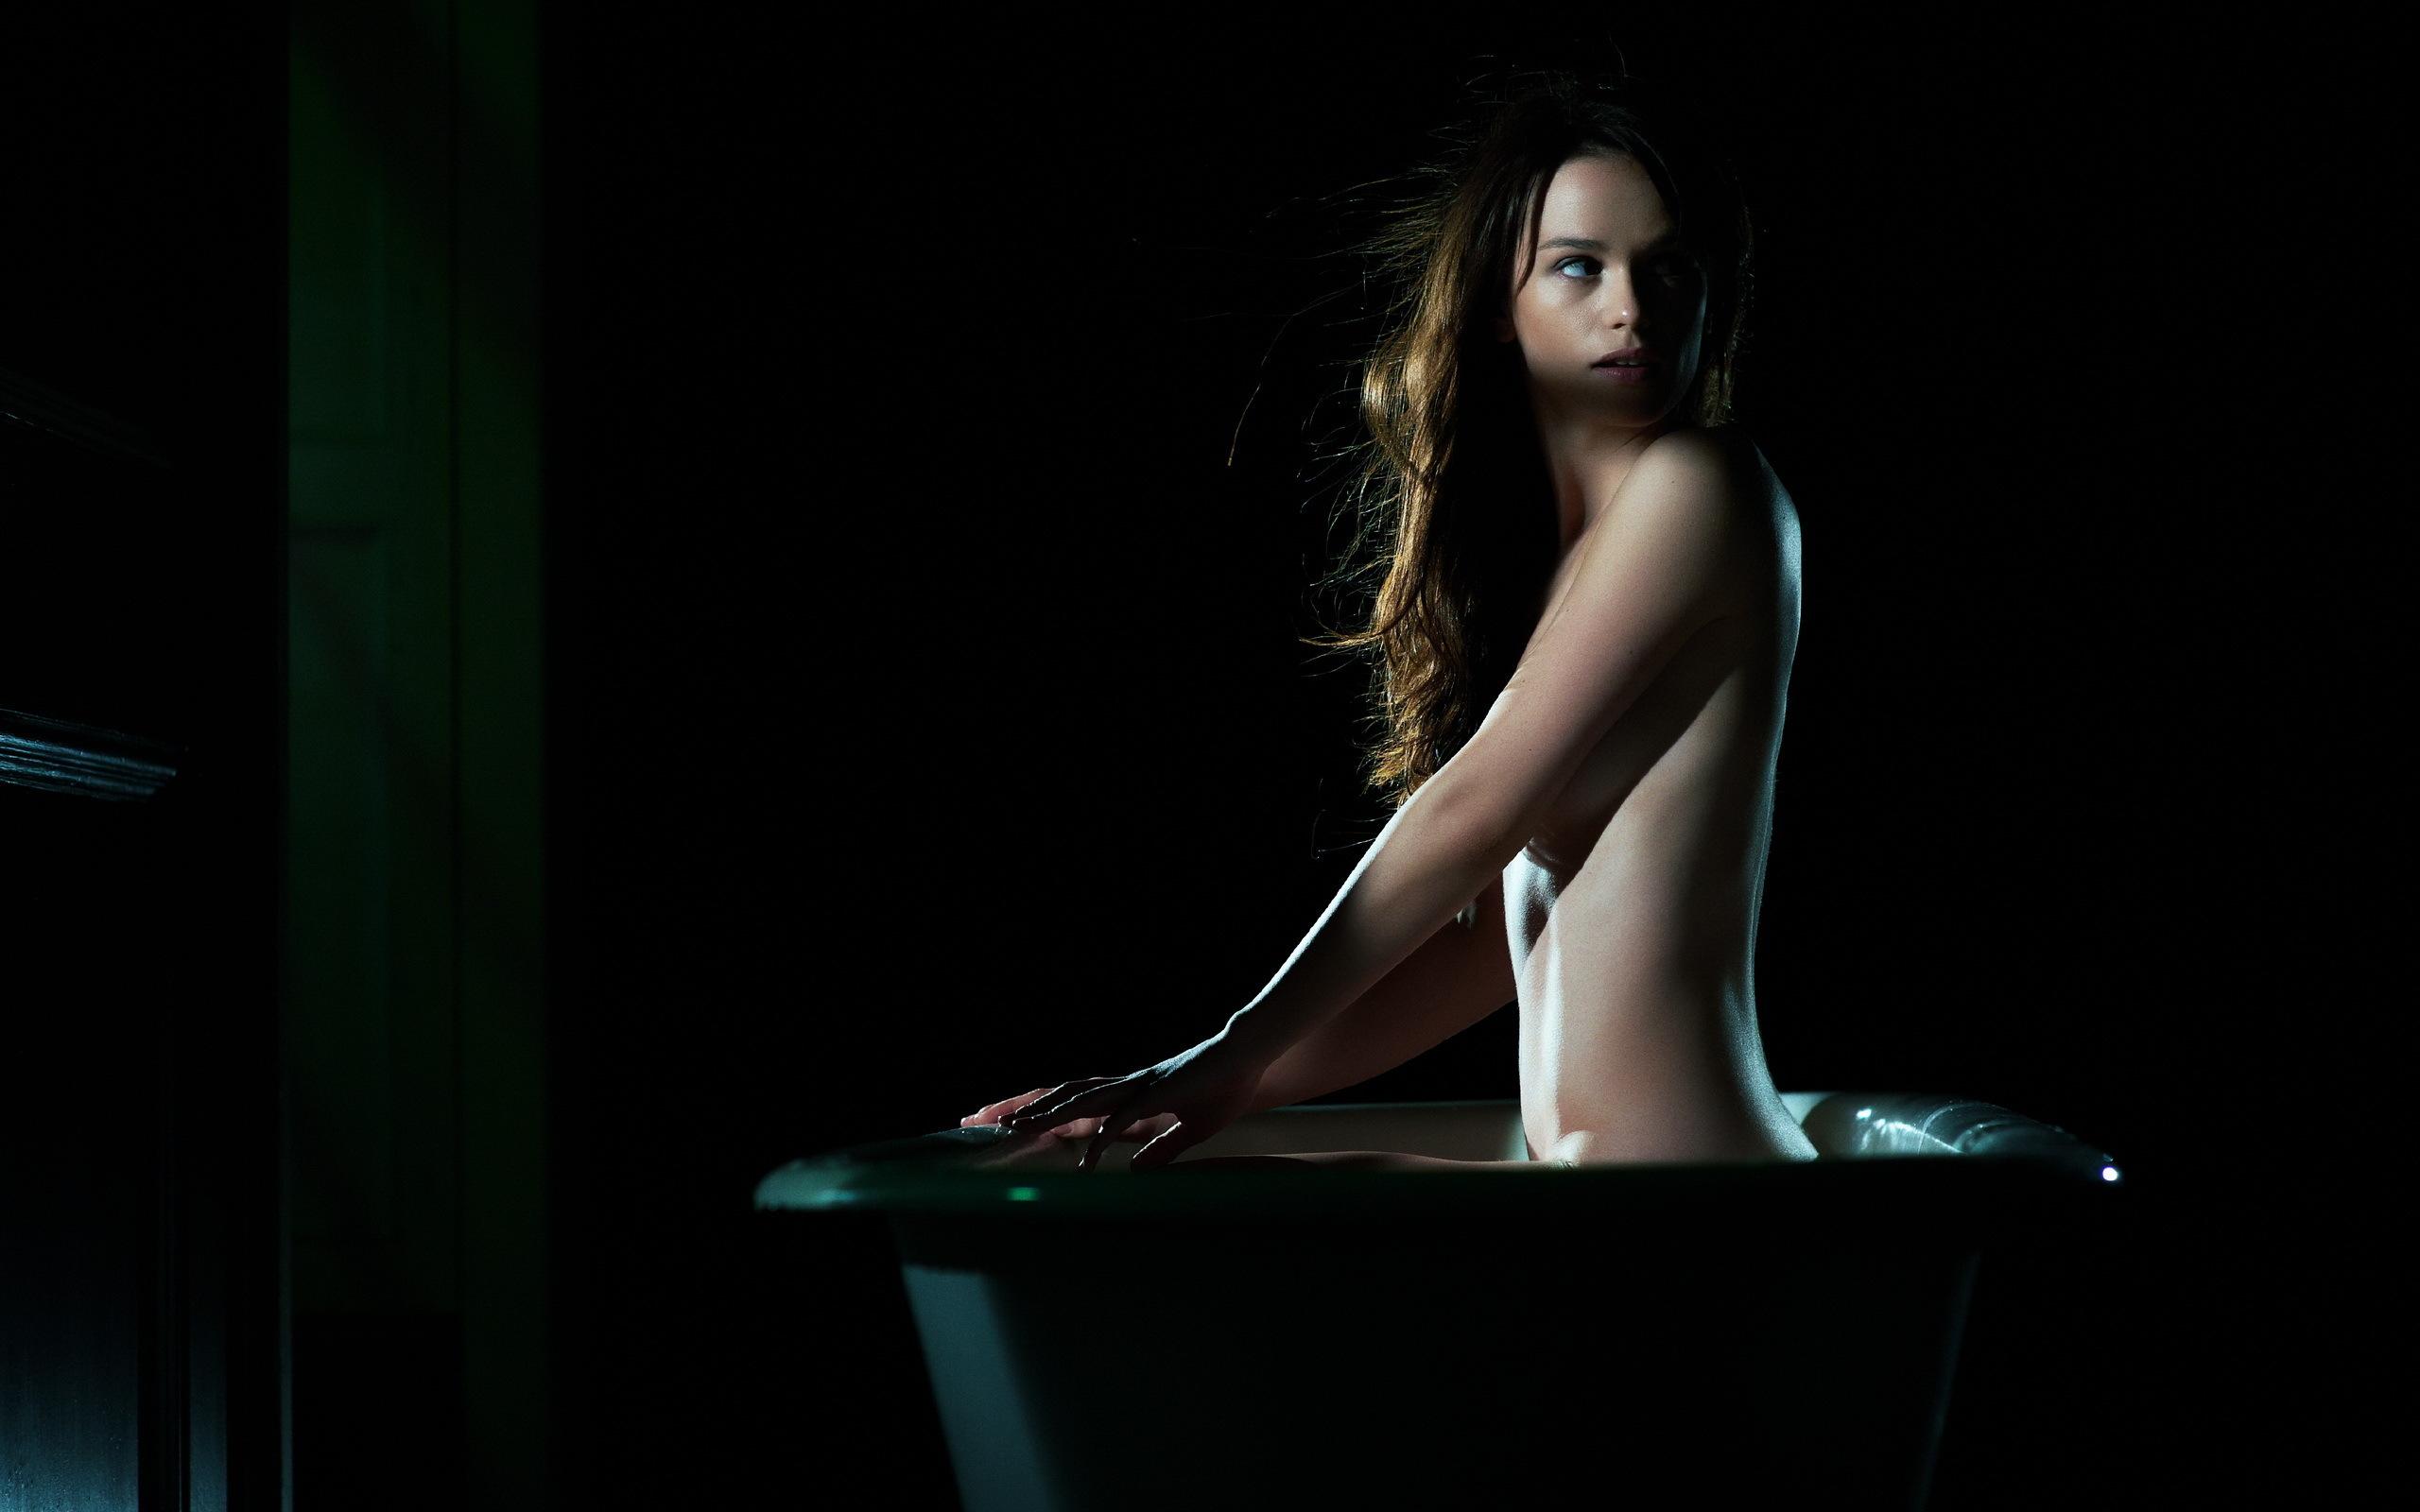 гвендолин тейлор порно фото